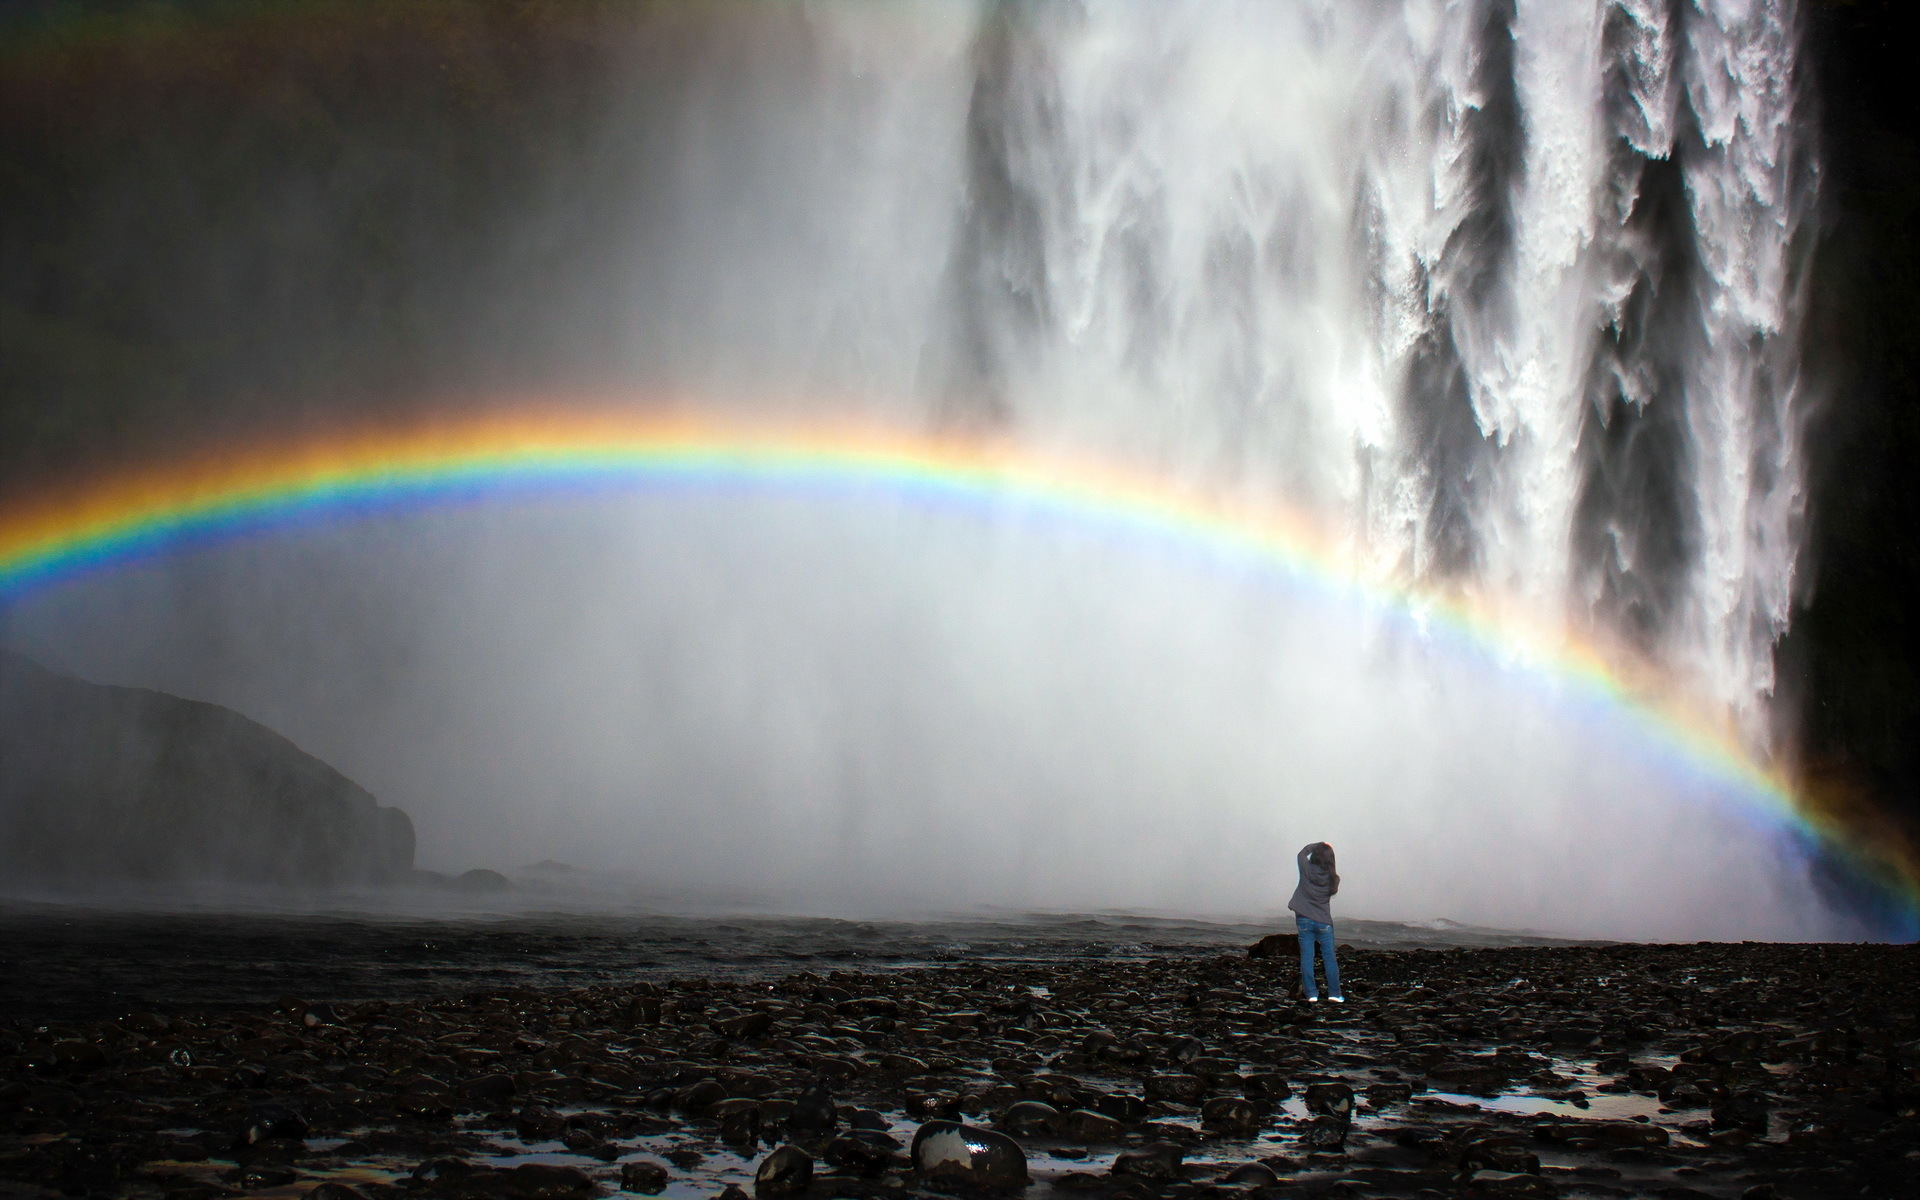 Animated Waterfalls Wallpapers Free Download Waterfall Rainbow Nature Mood Drops Fog Wallpaper